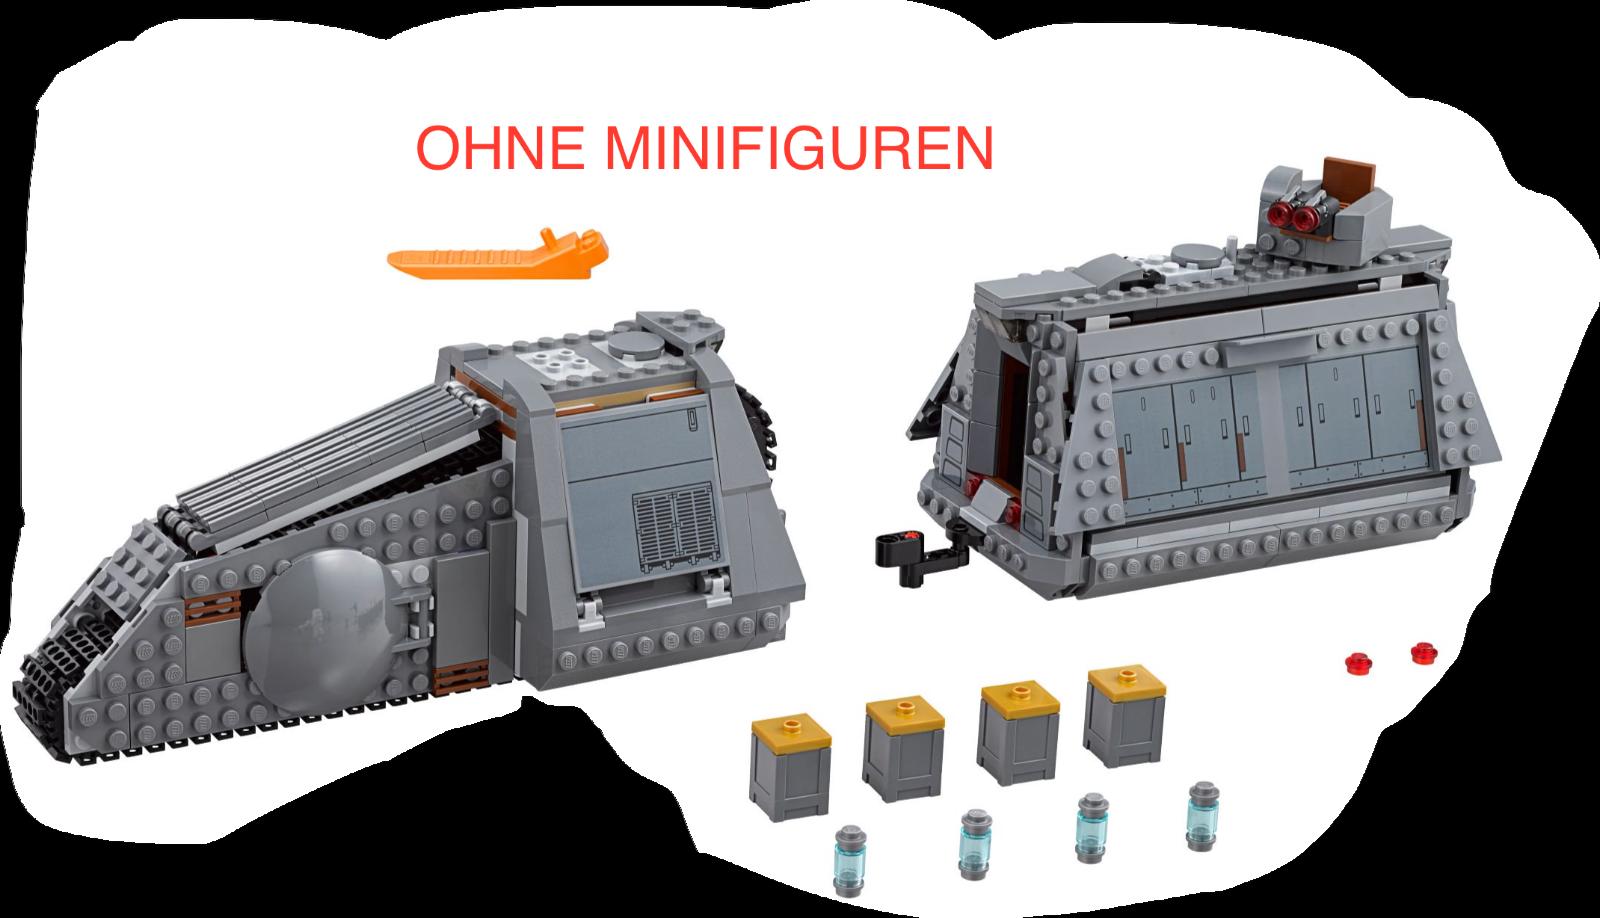 LEGO Star Wars - Imperial Conveyex Transport 75217 75217 75217 NEU OHNE MINIFIGUREN+BOX efd93a